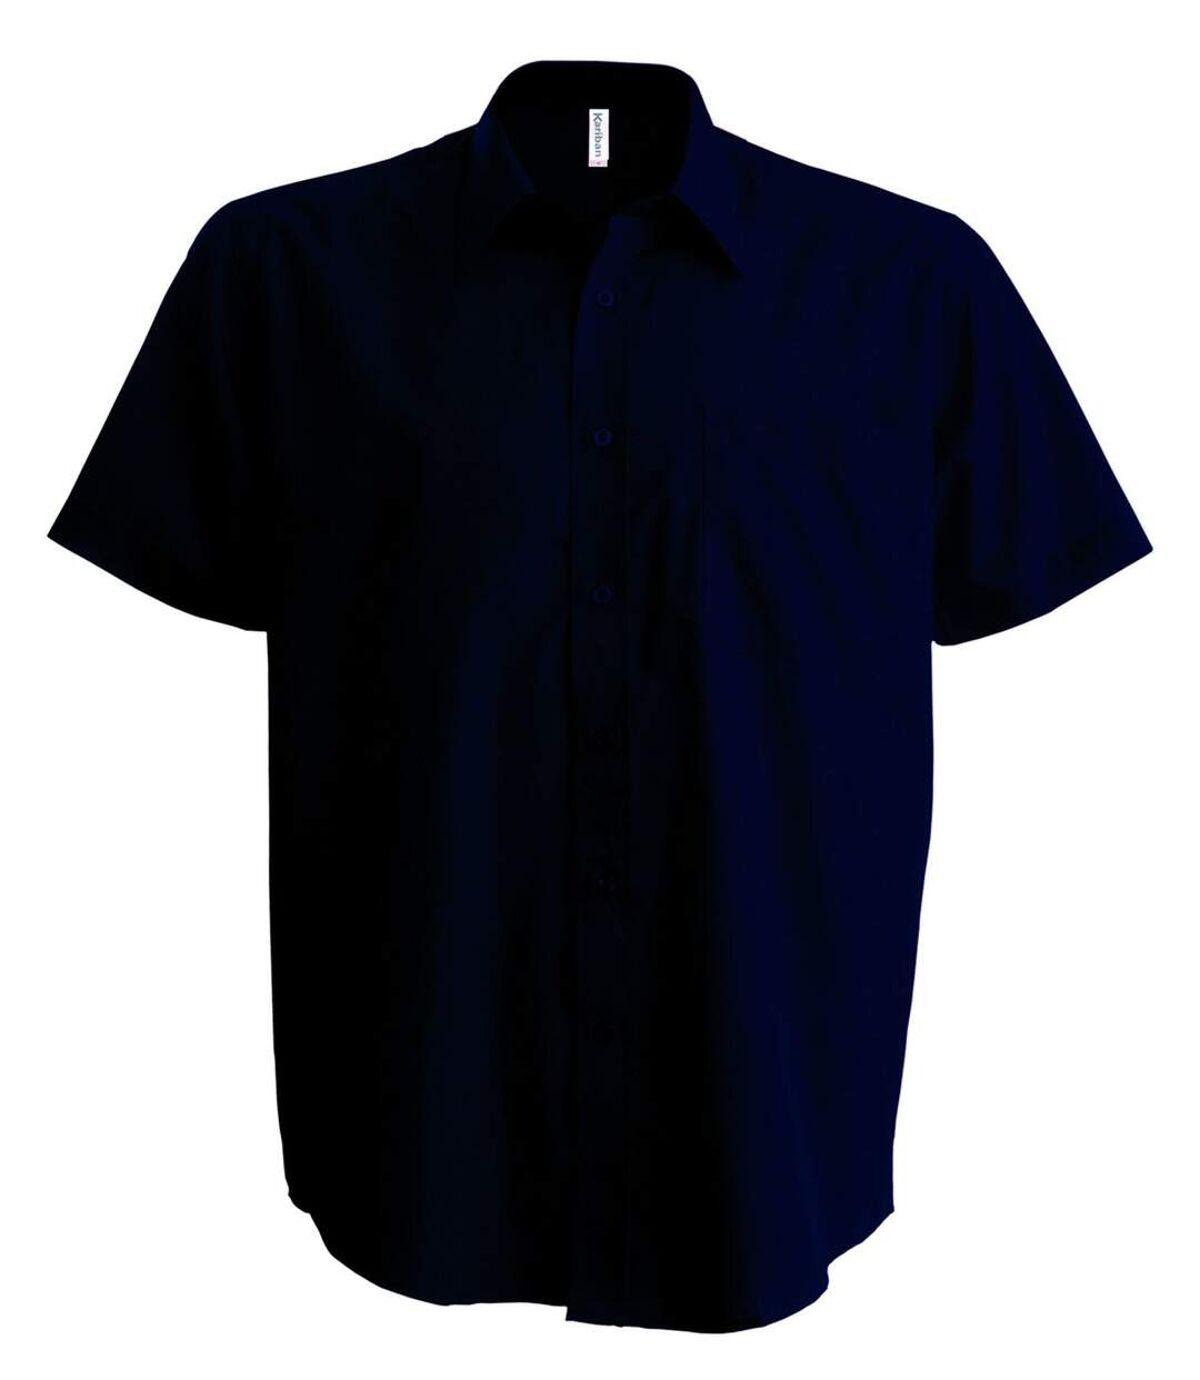 Chemise popeline manches courtes - K551- bleu marine - homme